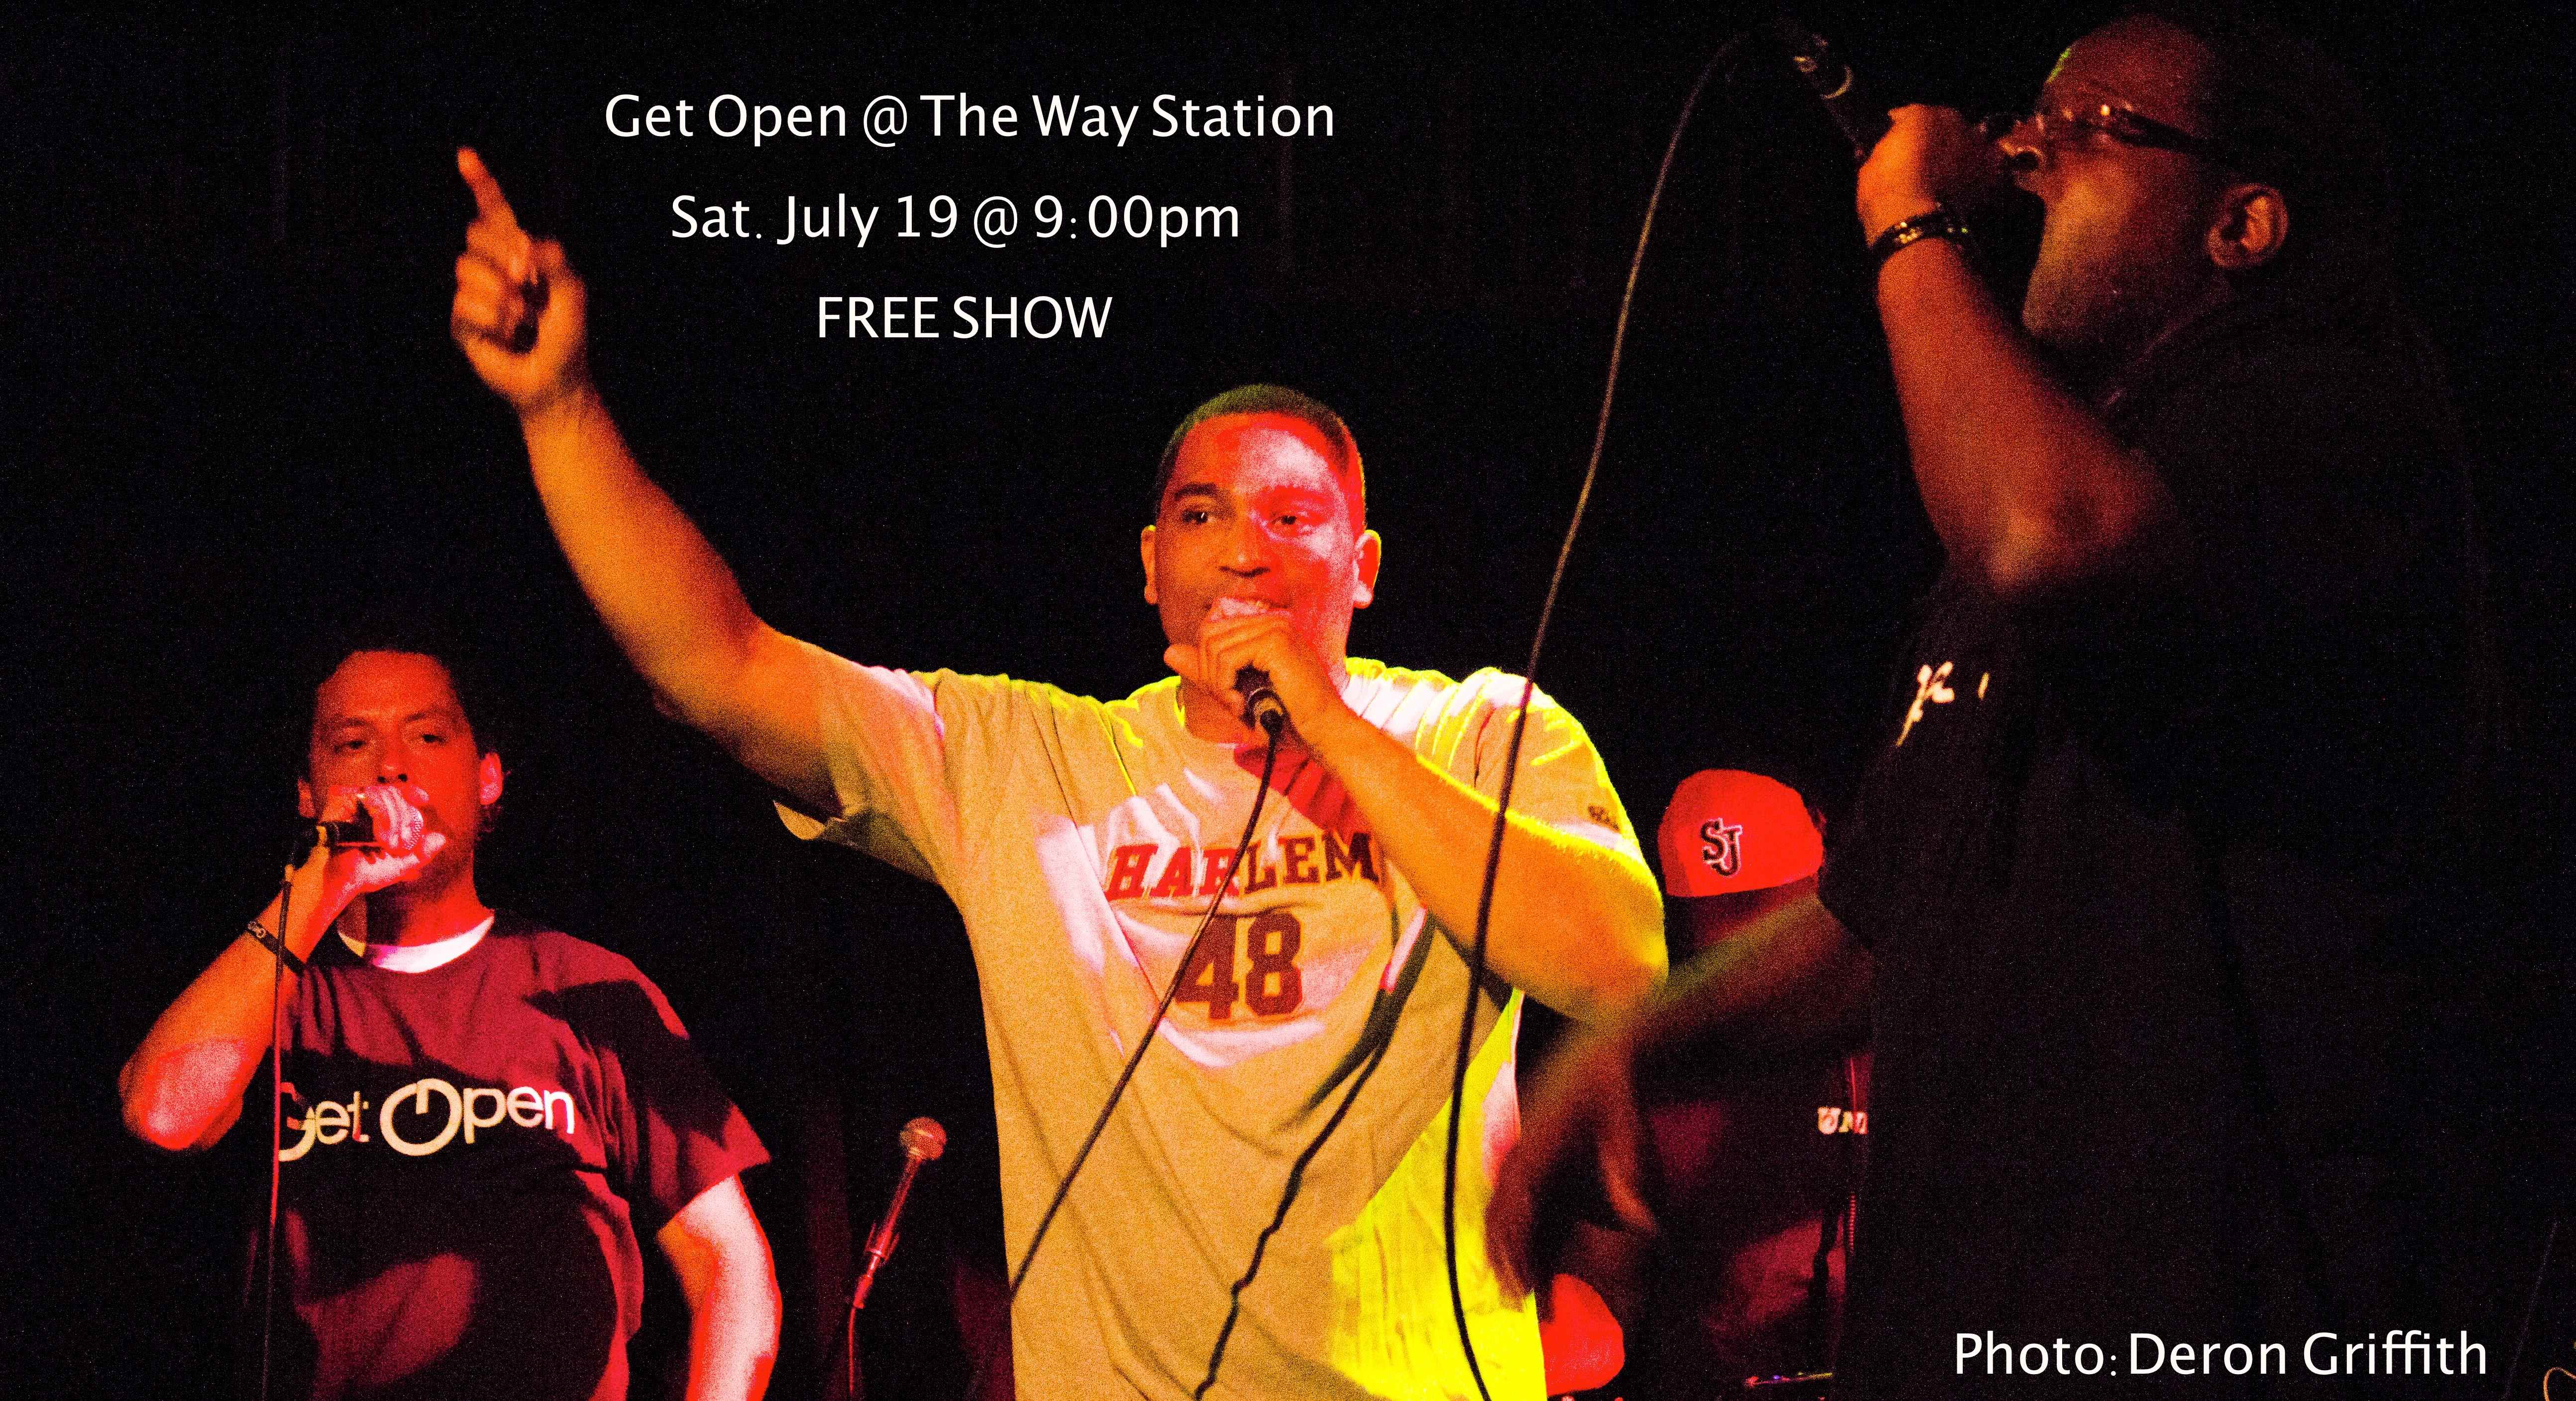 Get Open @TheWayStation